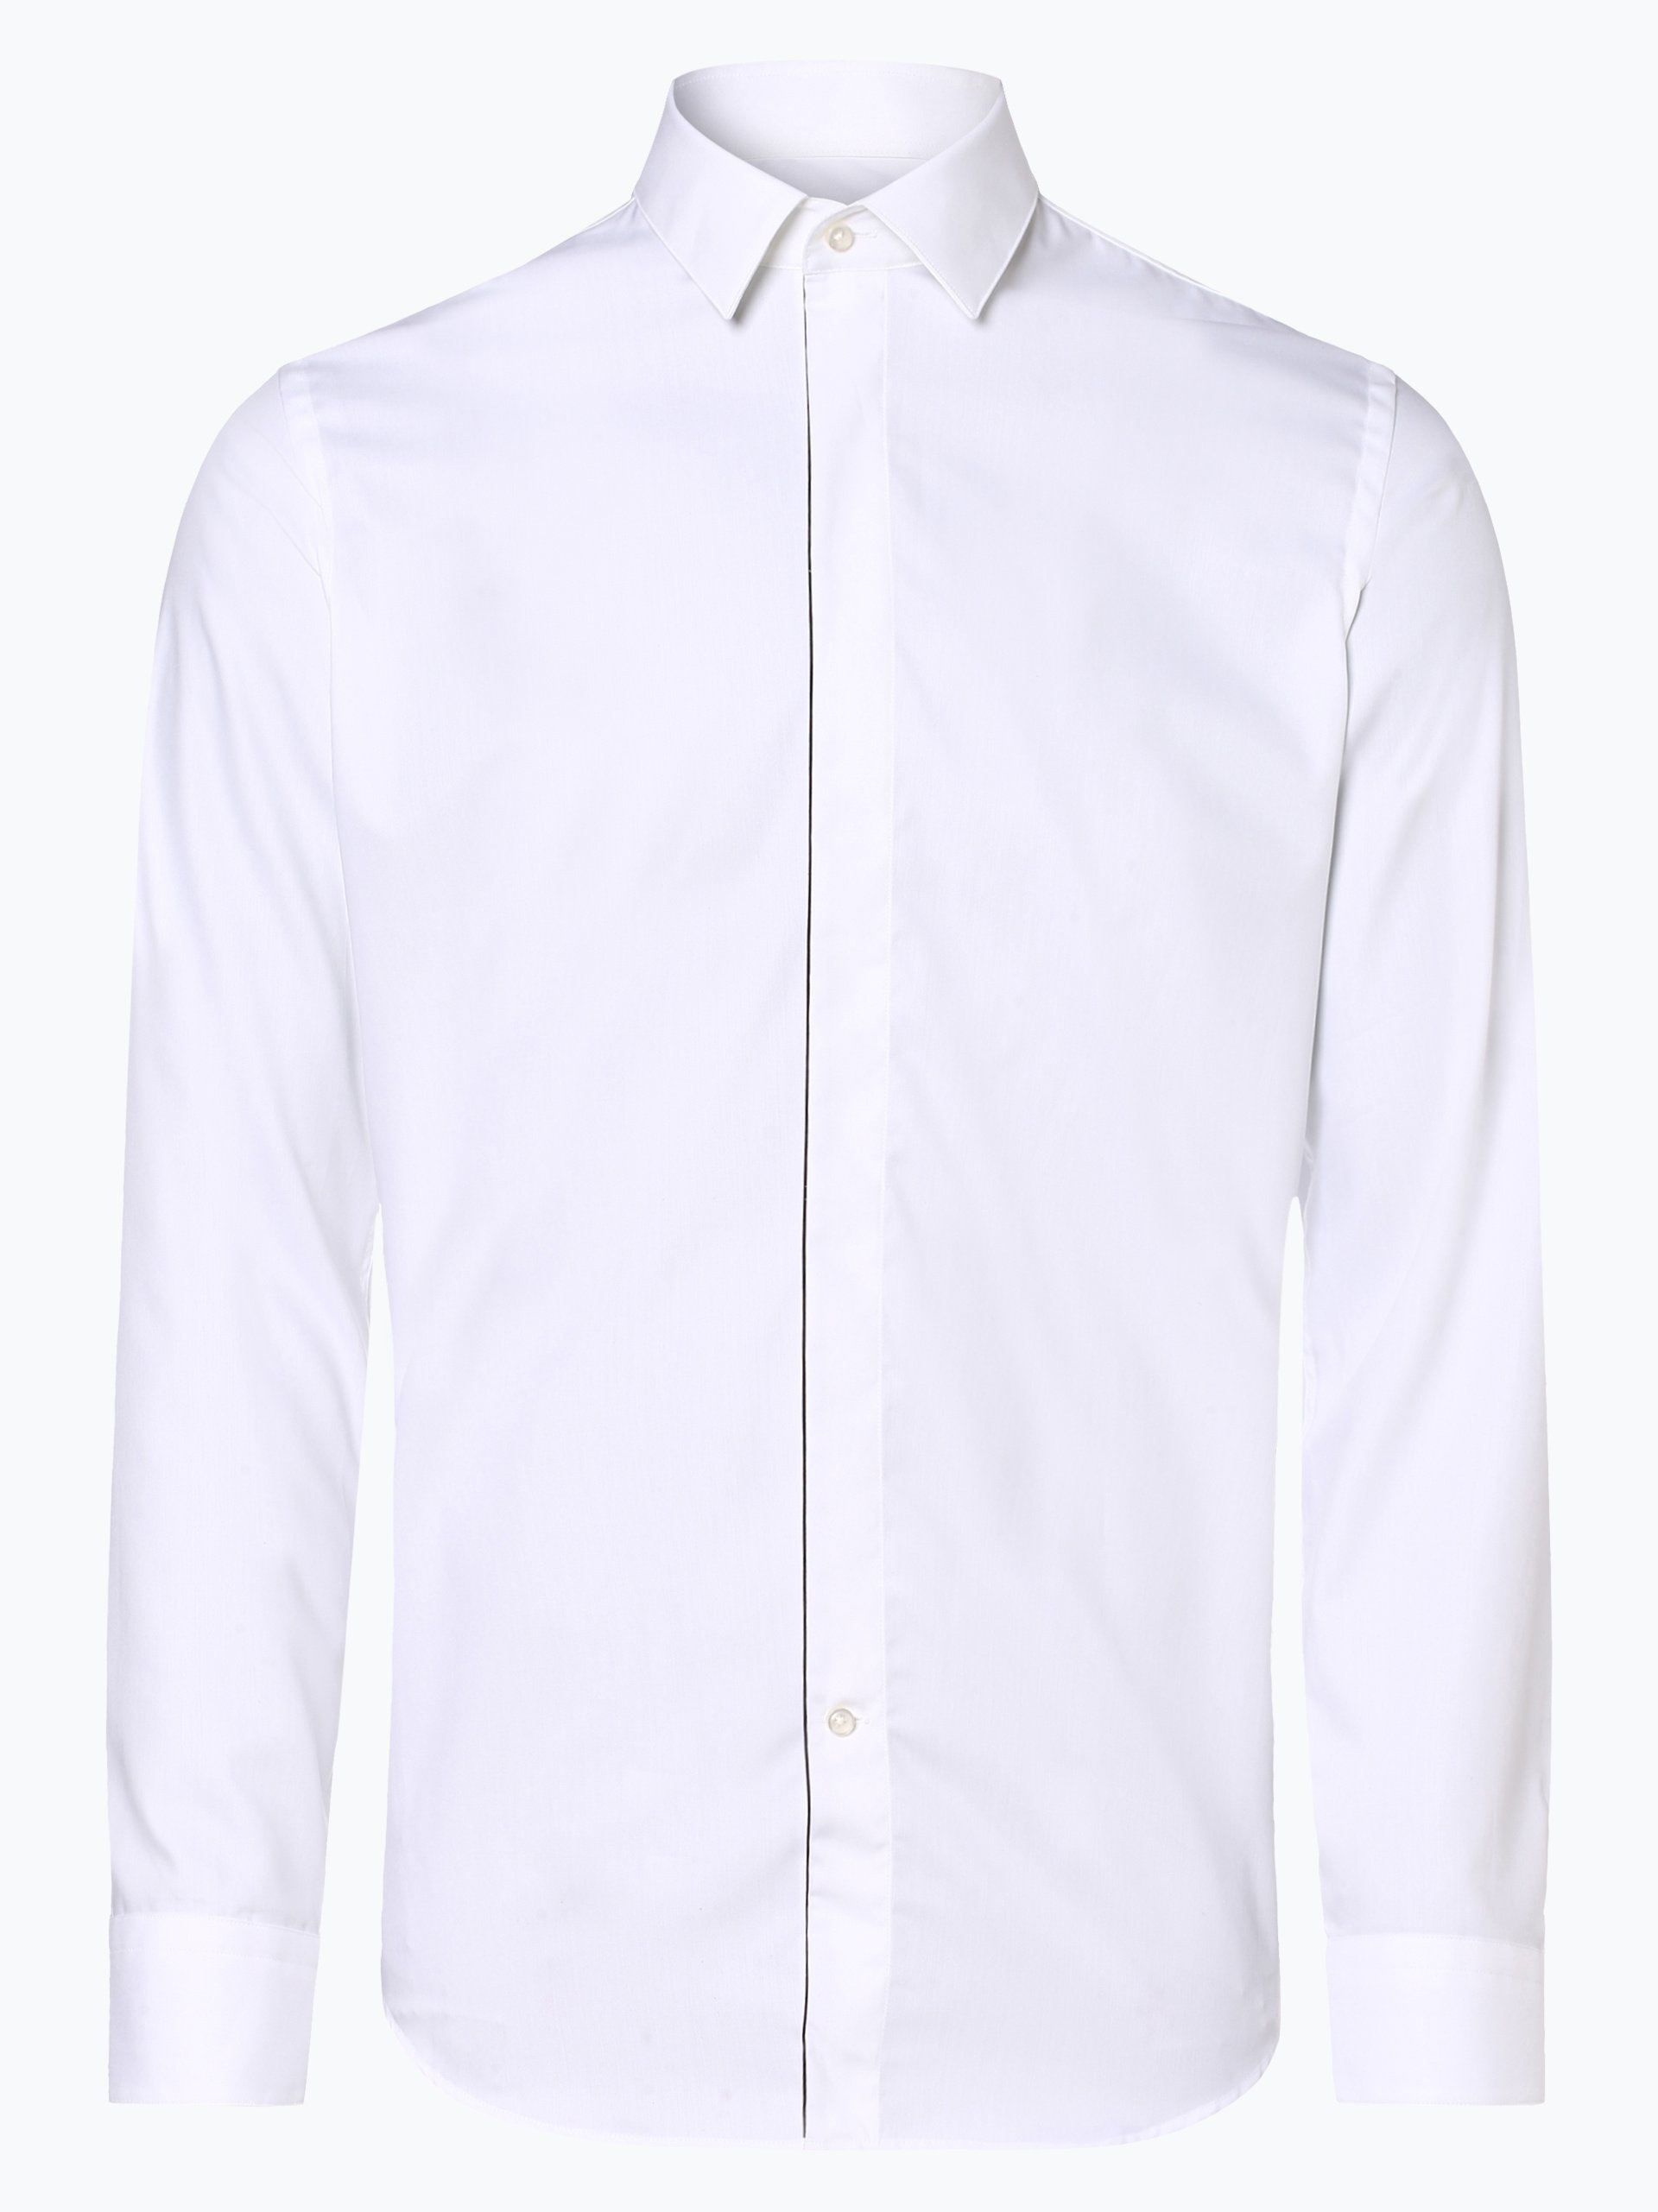 BOSS Herren Hemd - Bügelleicht - Jivan